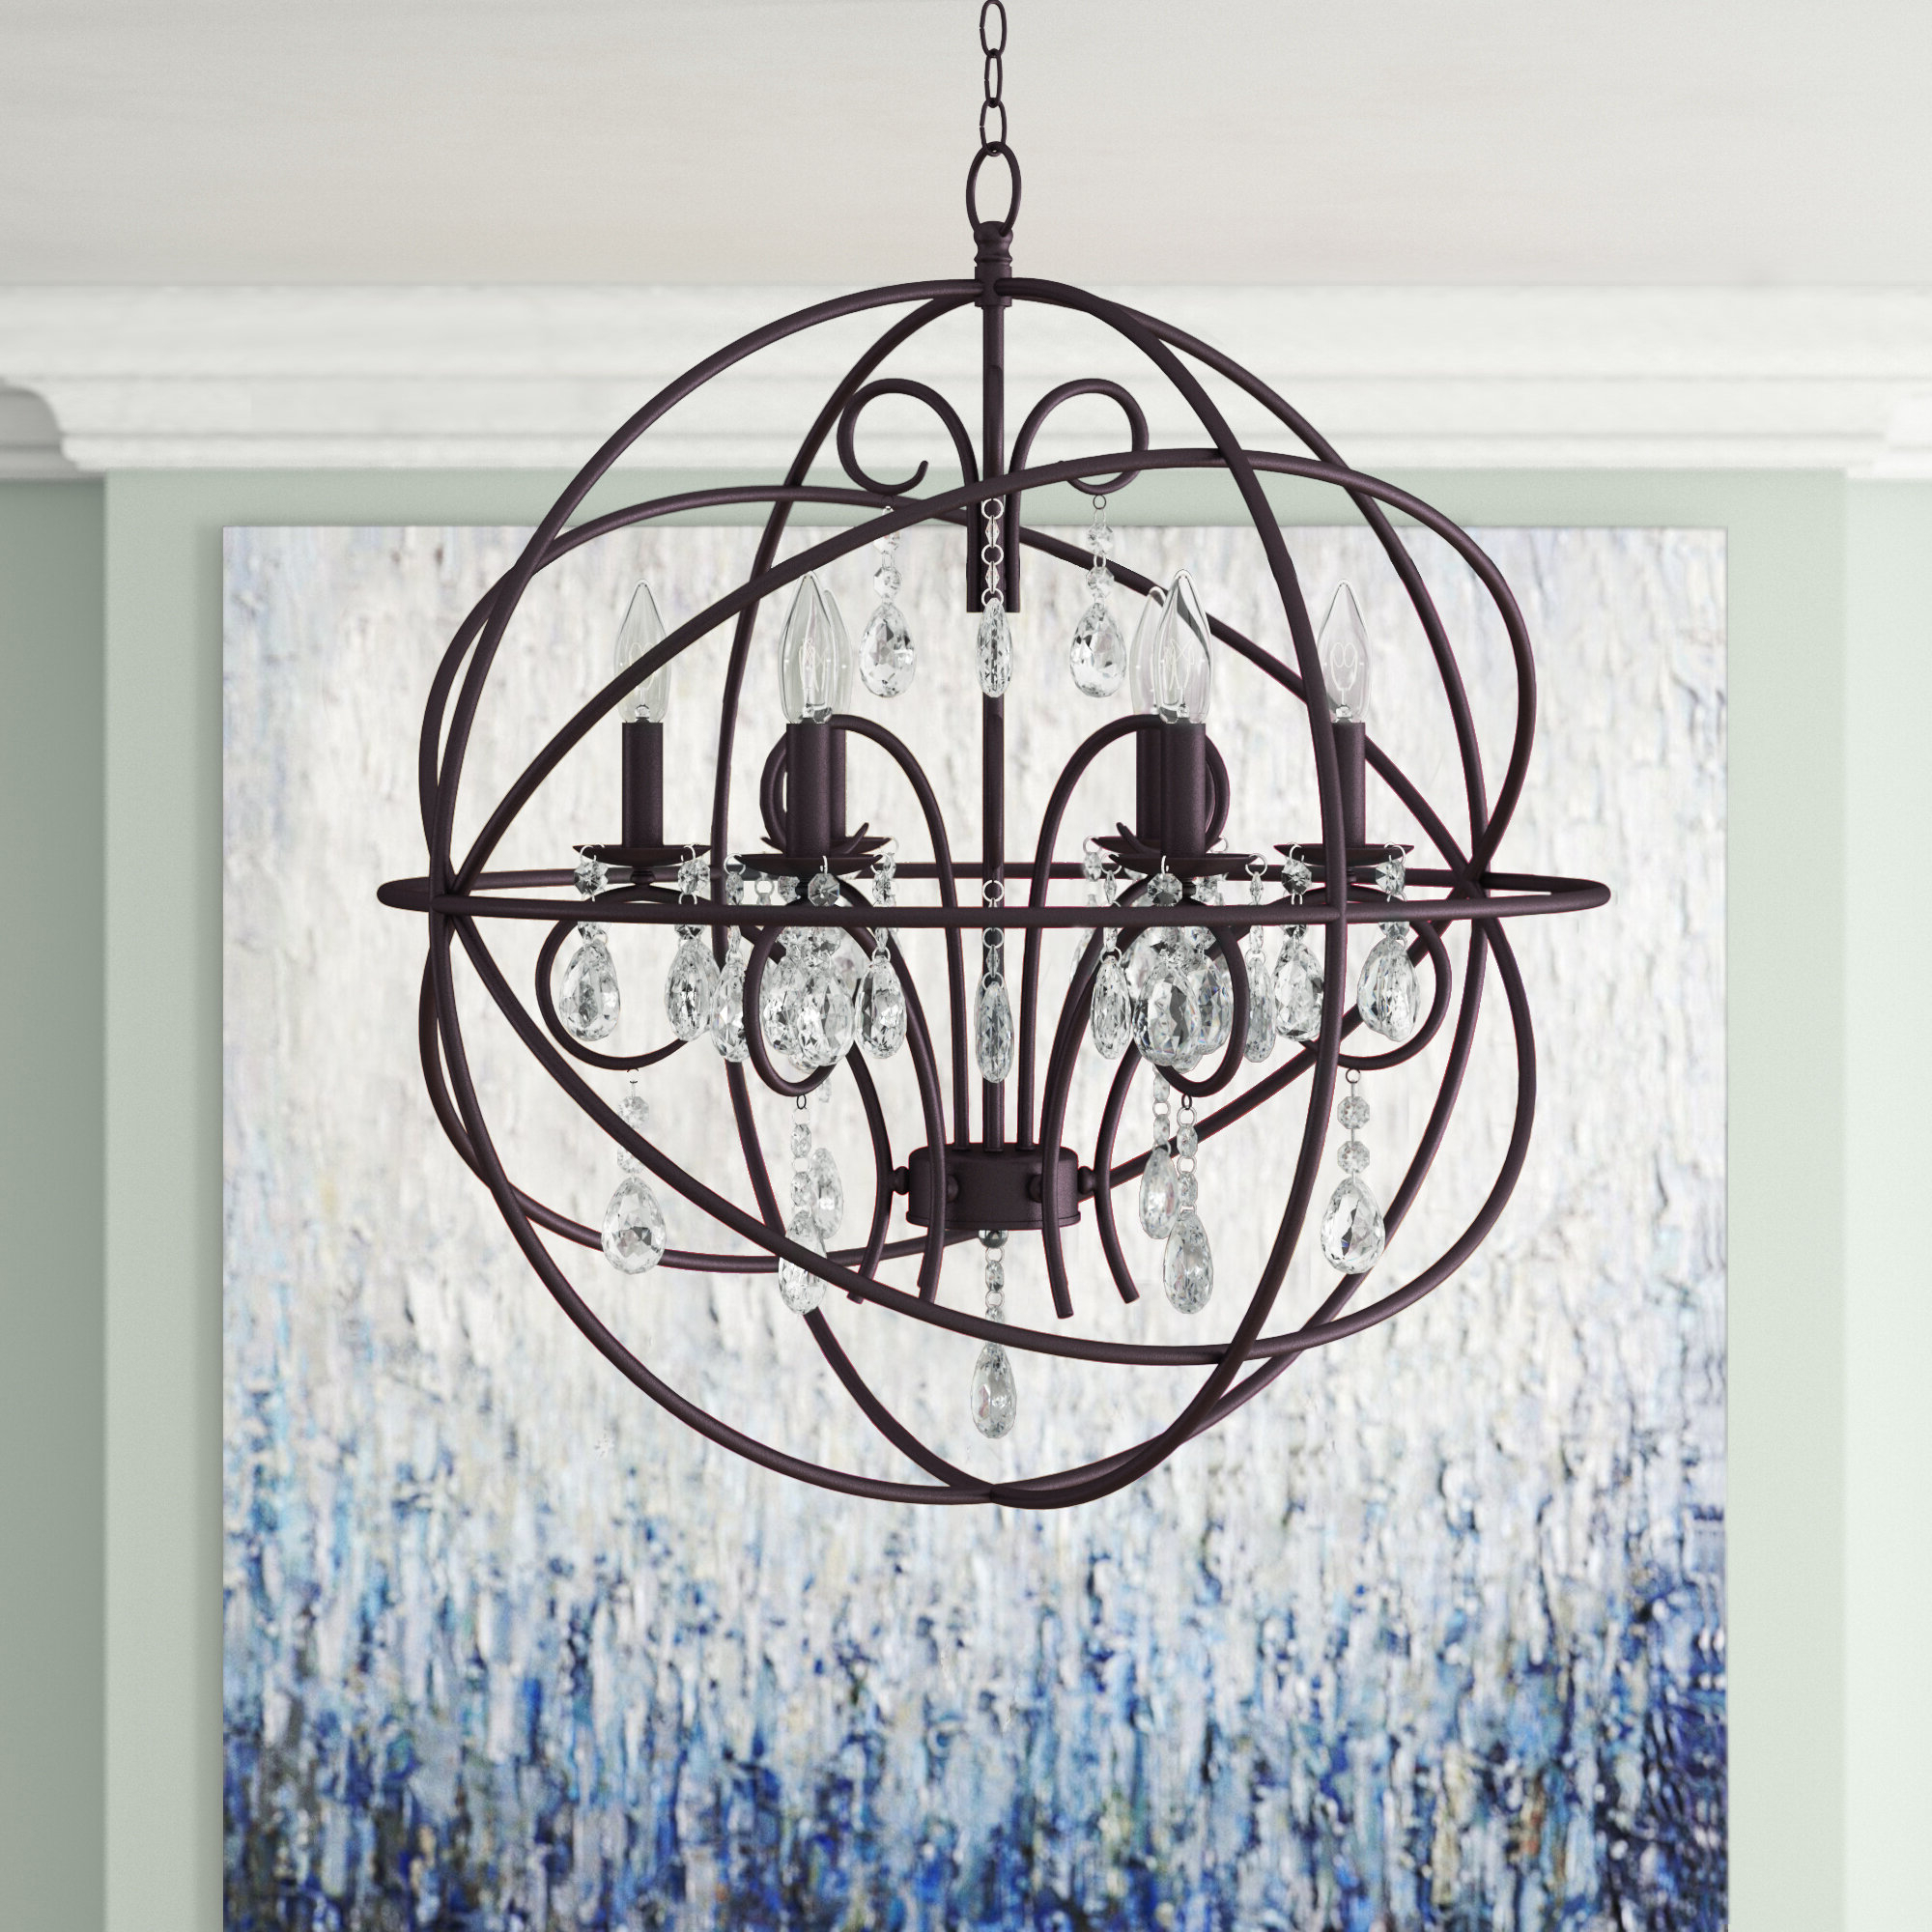 Best And Newest Alden 6 Light Globe Chandelier Throughout Joon 6 Light Globe Chandeliers (View 14 of 20)